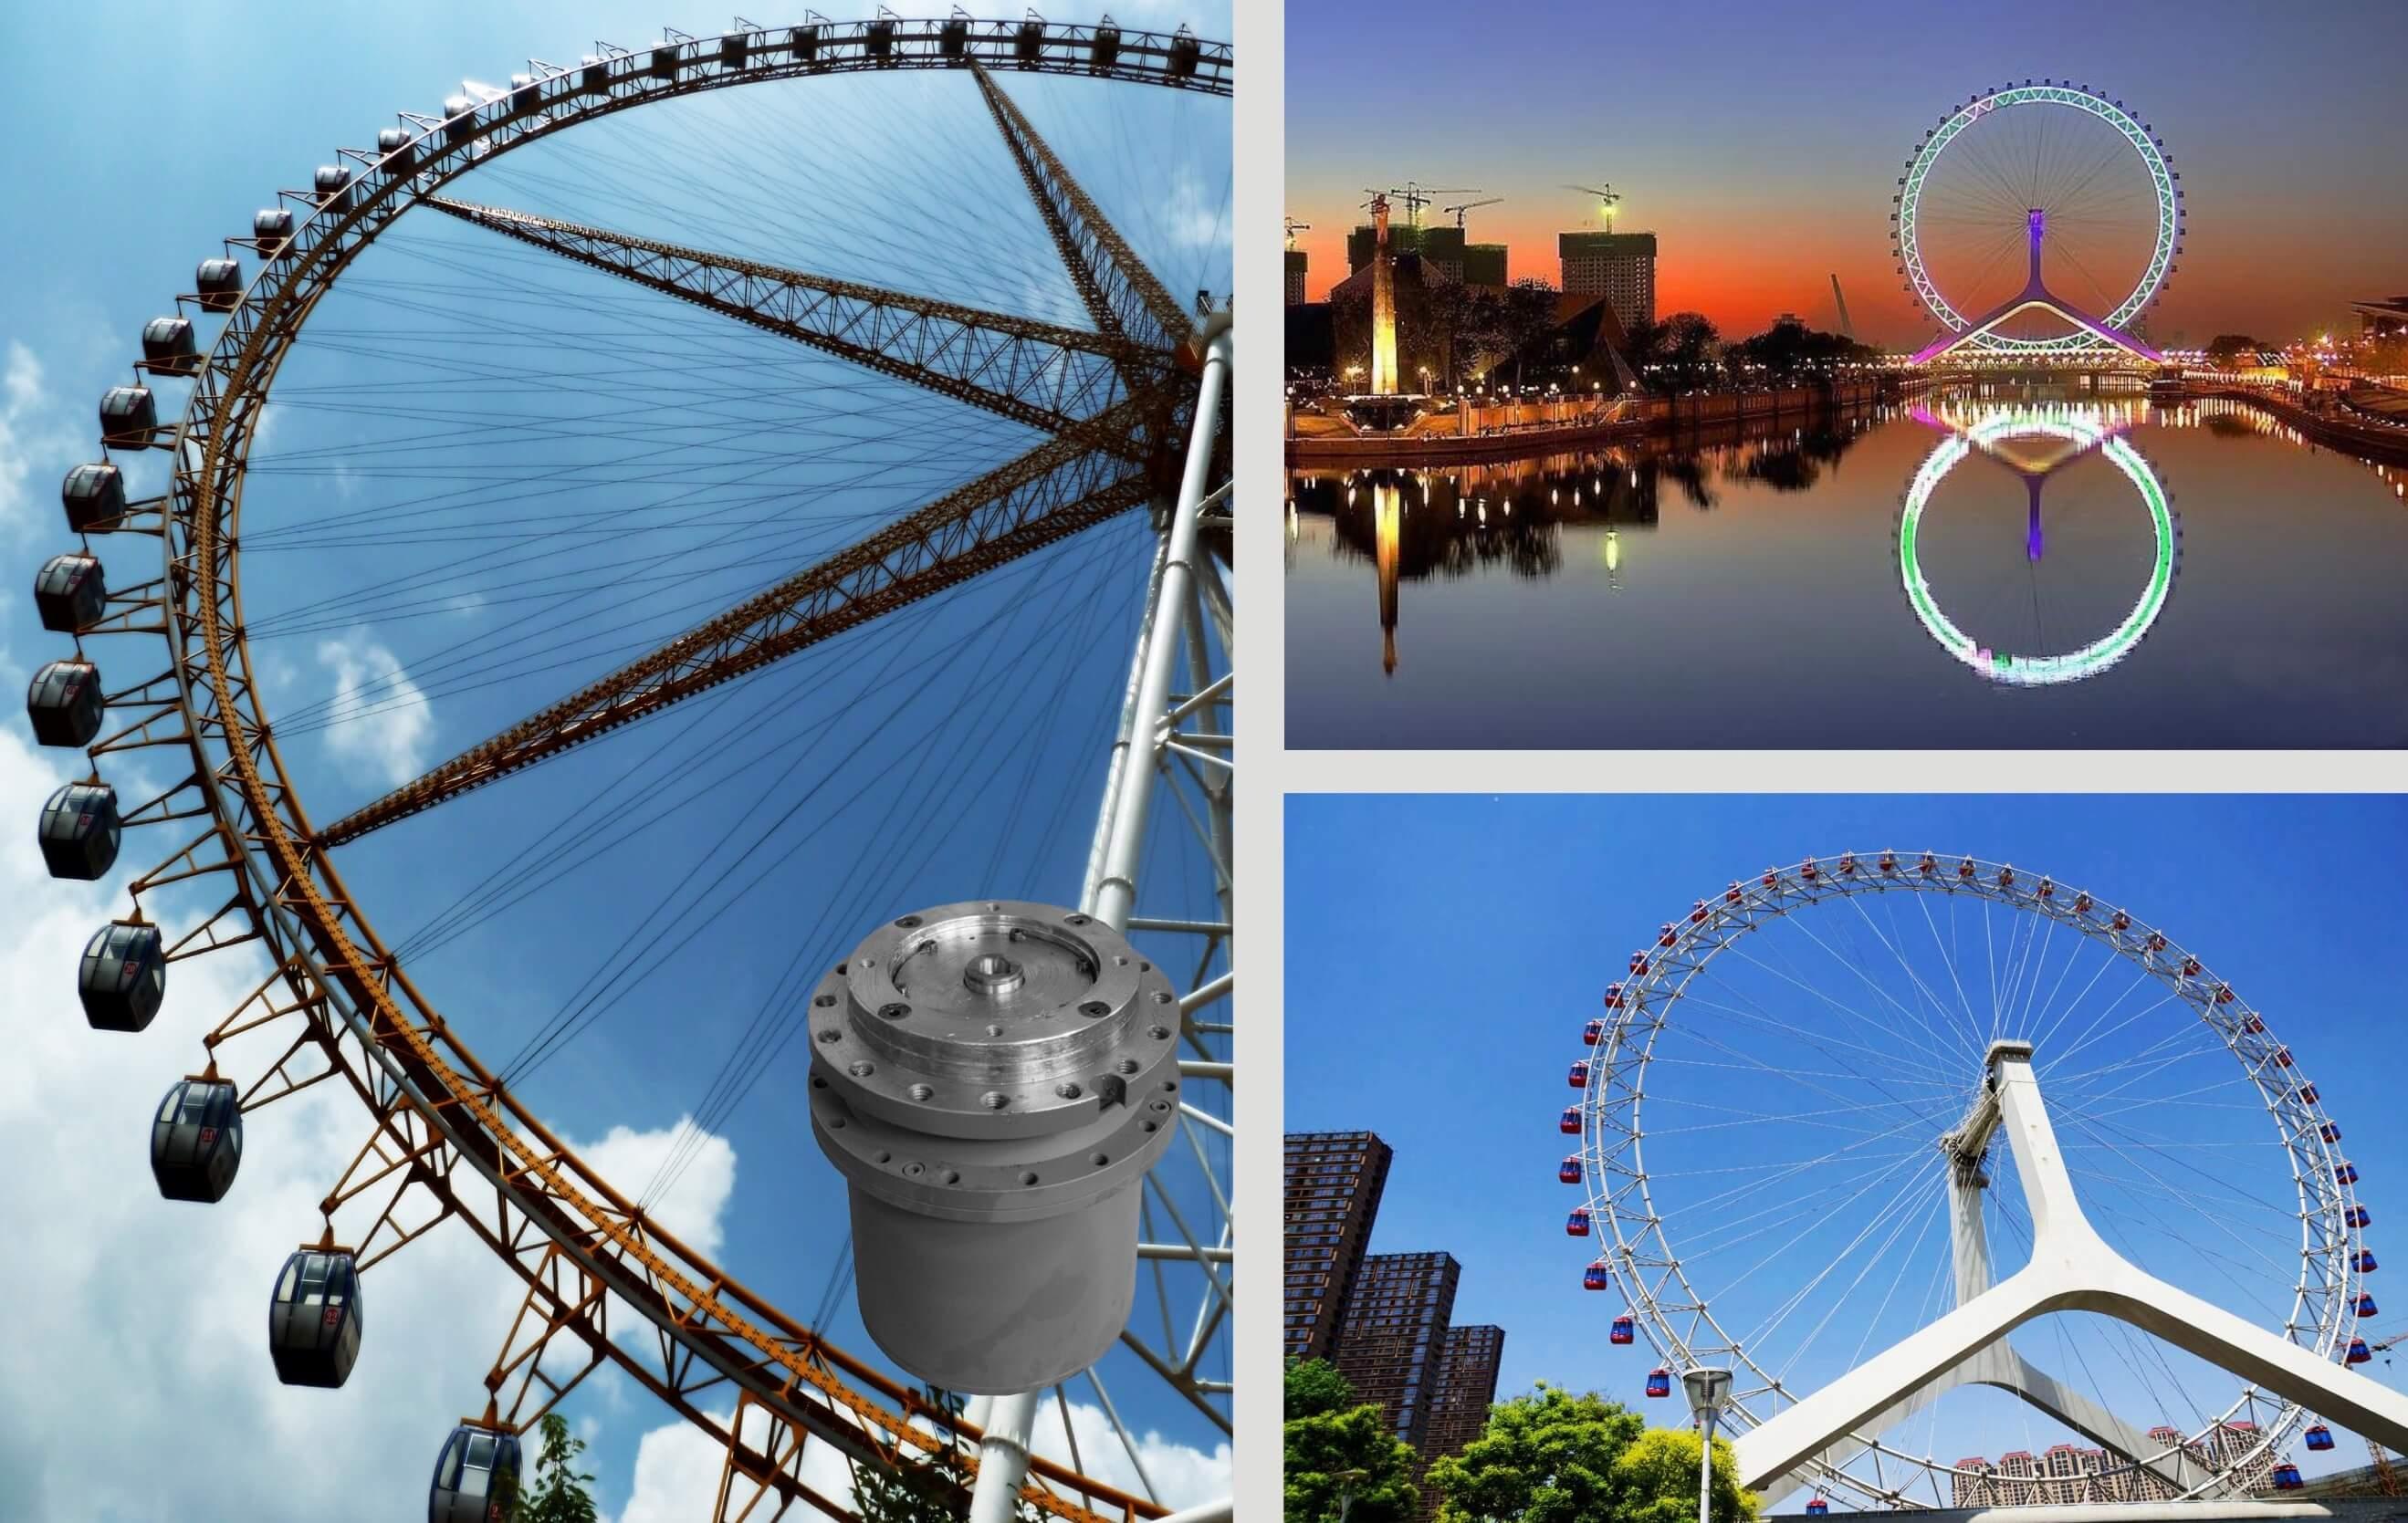 Ferris Wheel (Planetary Gearbox)